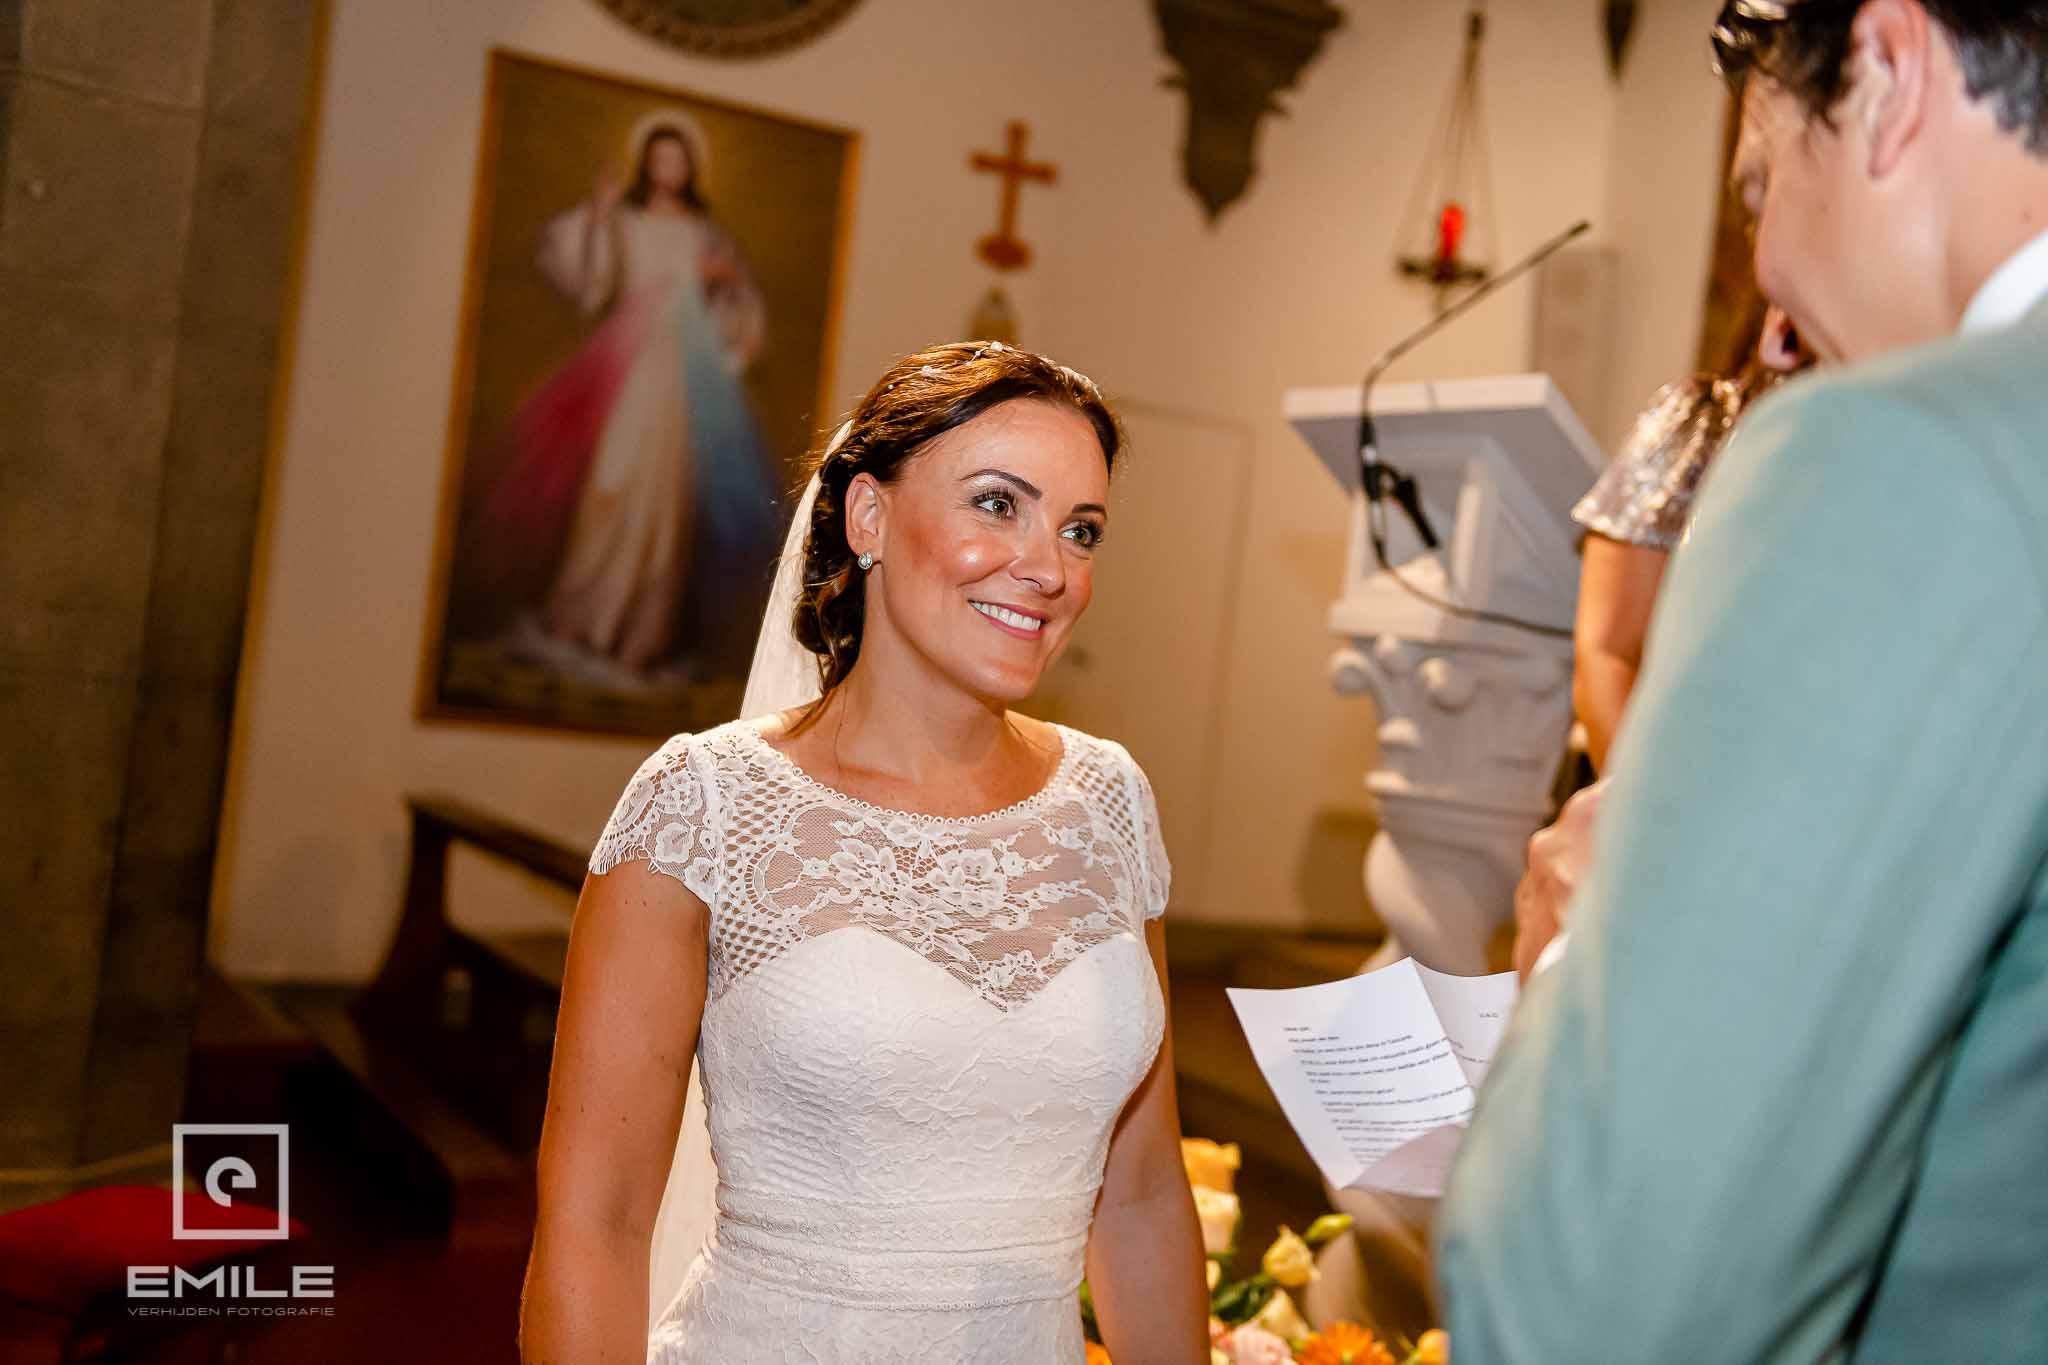 Stralende bruid luisterend naar de geloftes van de bruidegom - Destination wedding San Gimignano - Toscane Italie - Iris en Job